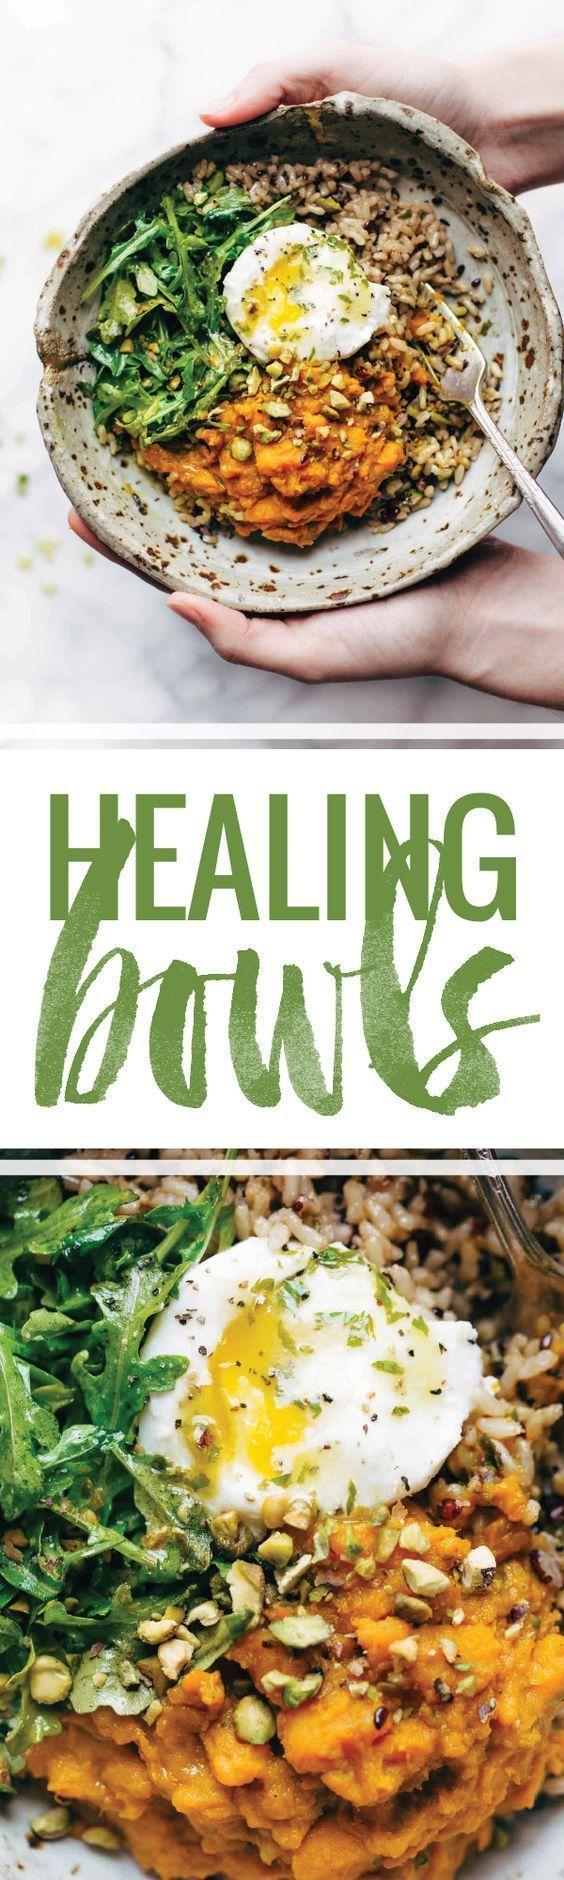 Healing Bowls: turmeric sweet potatoes, brown rice, red quinoa, arugula, poached egg, lemon dressing.